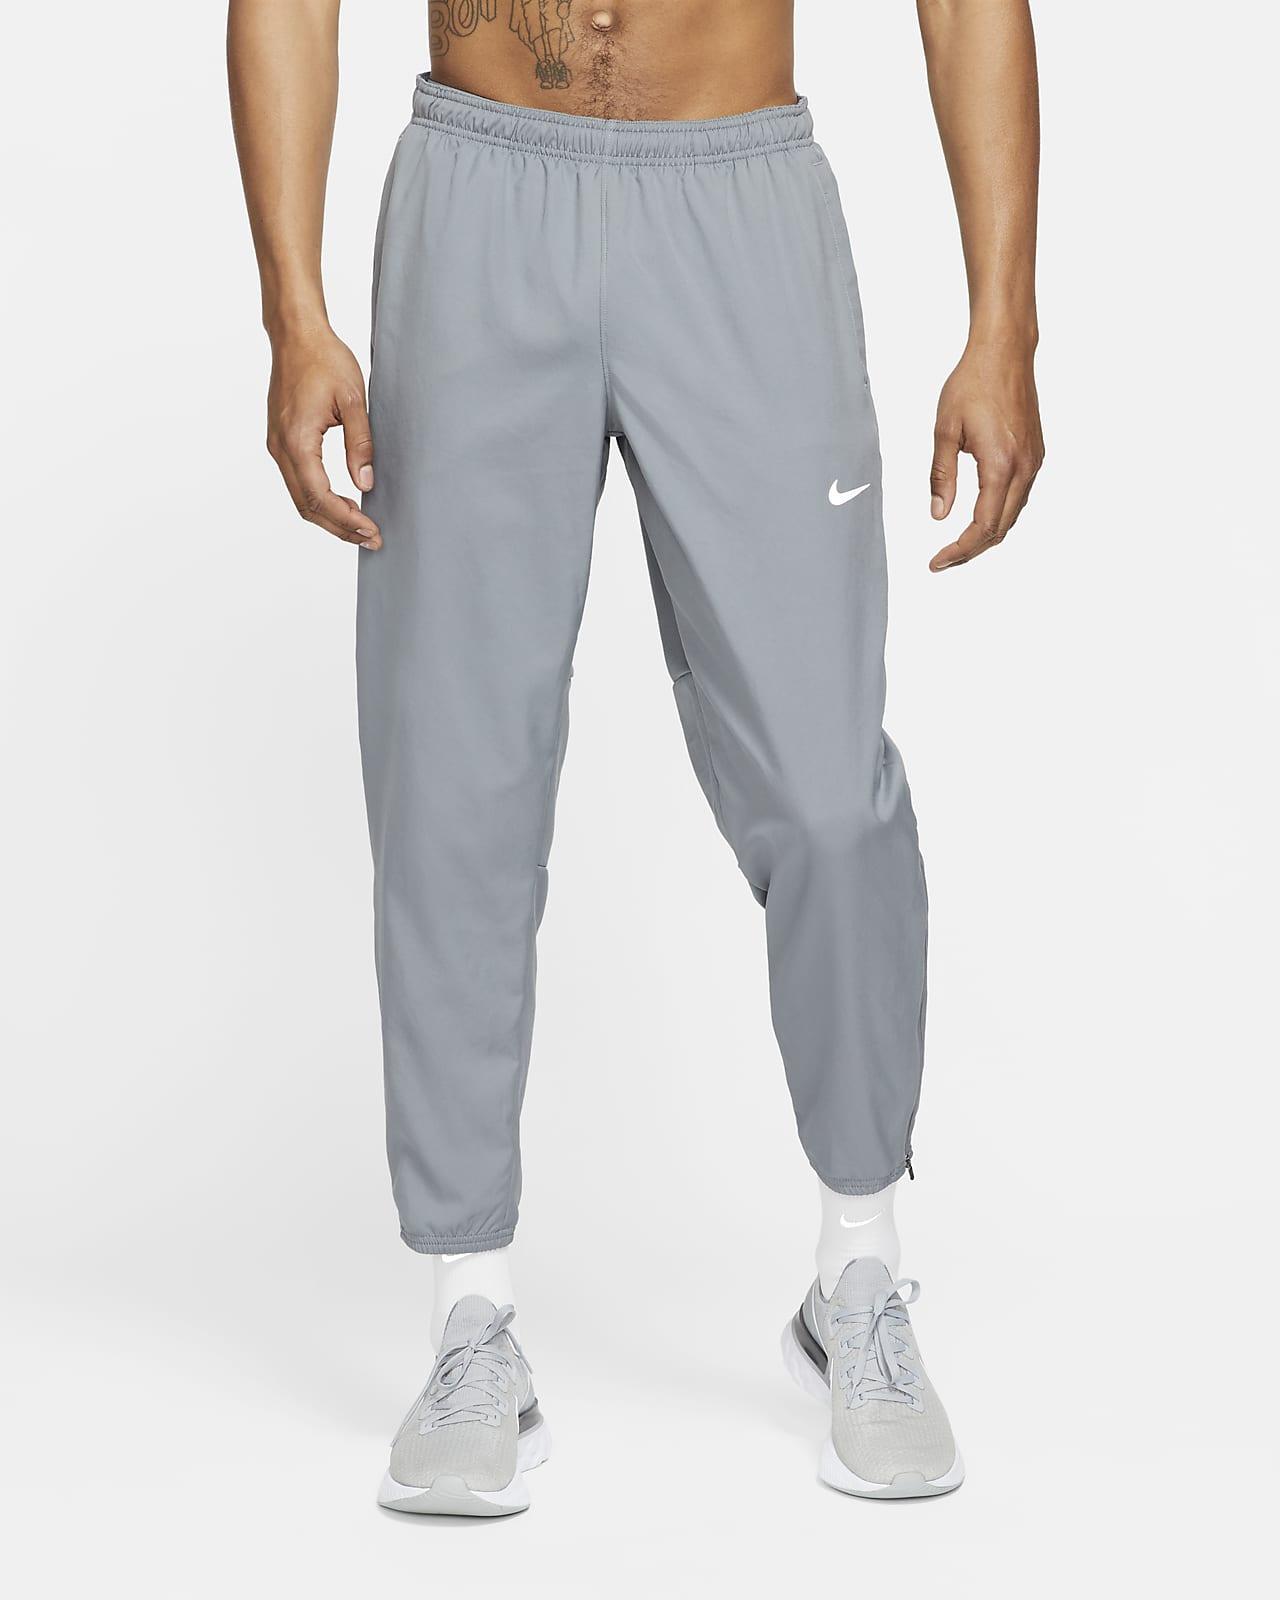 Nike Dri-FIT Challenger Men's Woven Running Trousers